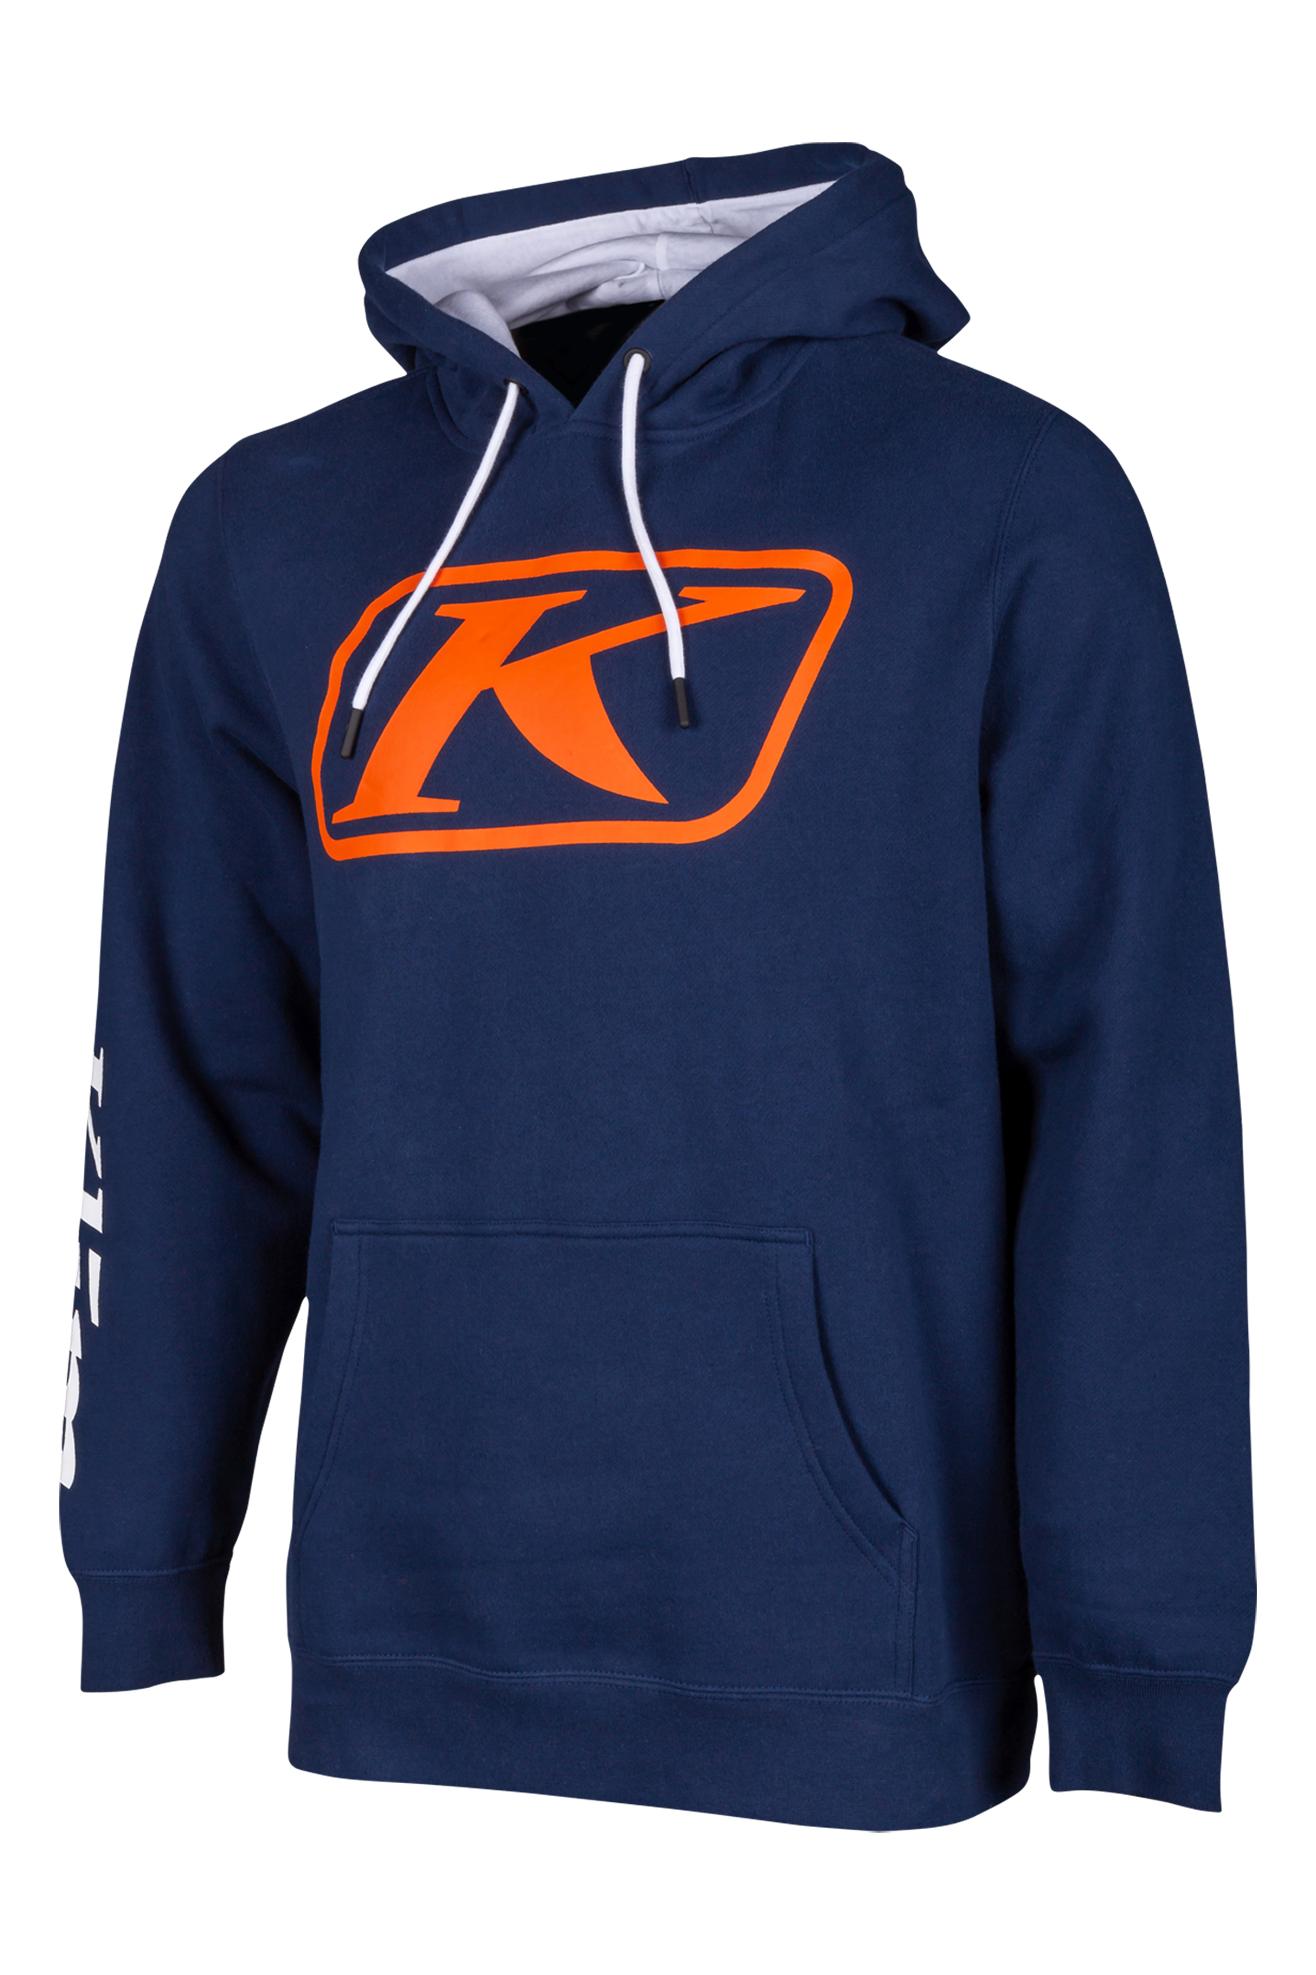 KLIM Felpa  K Corp Blu-Arancio